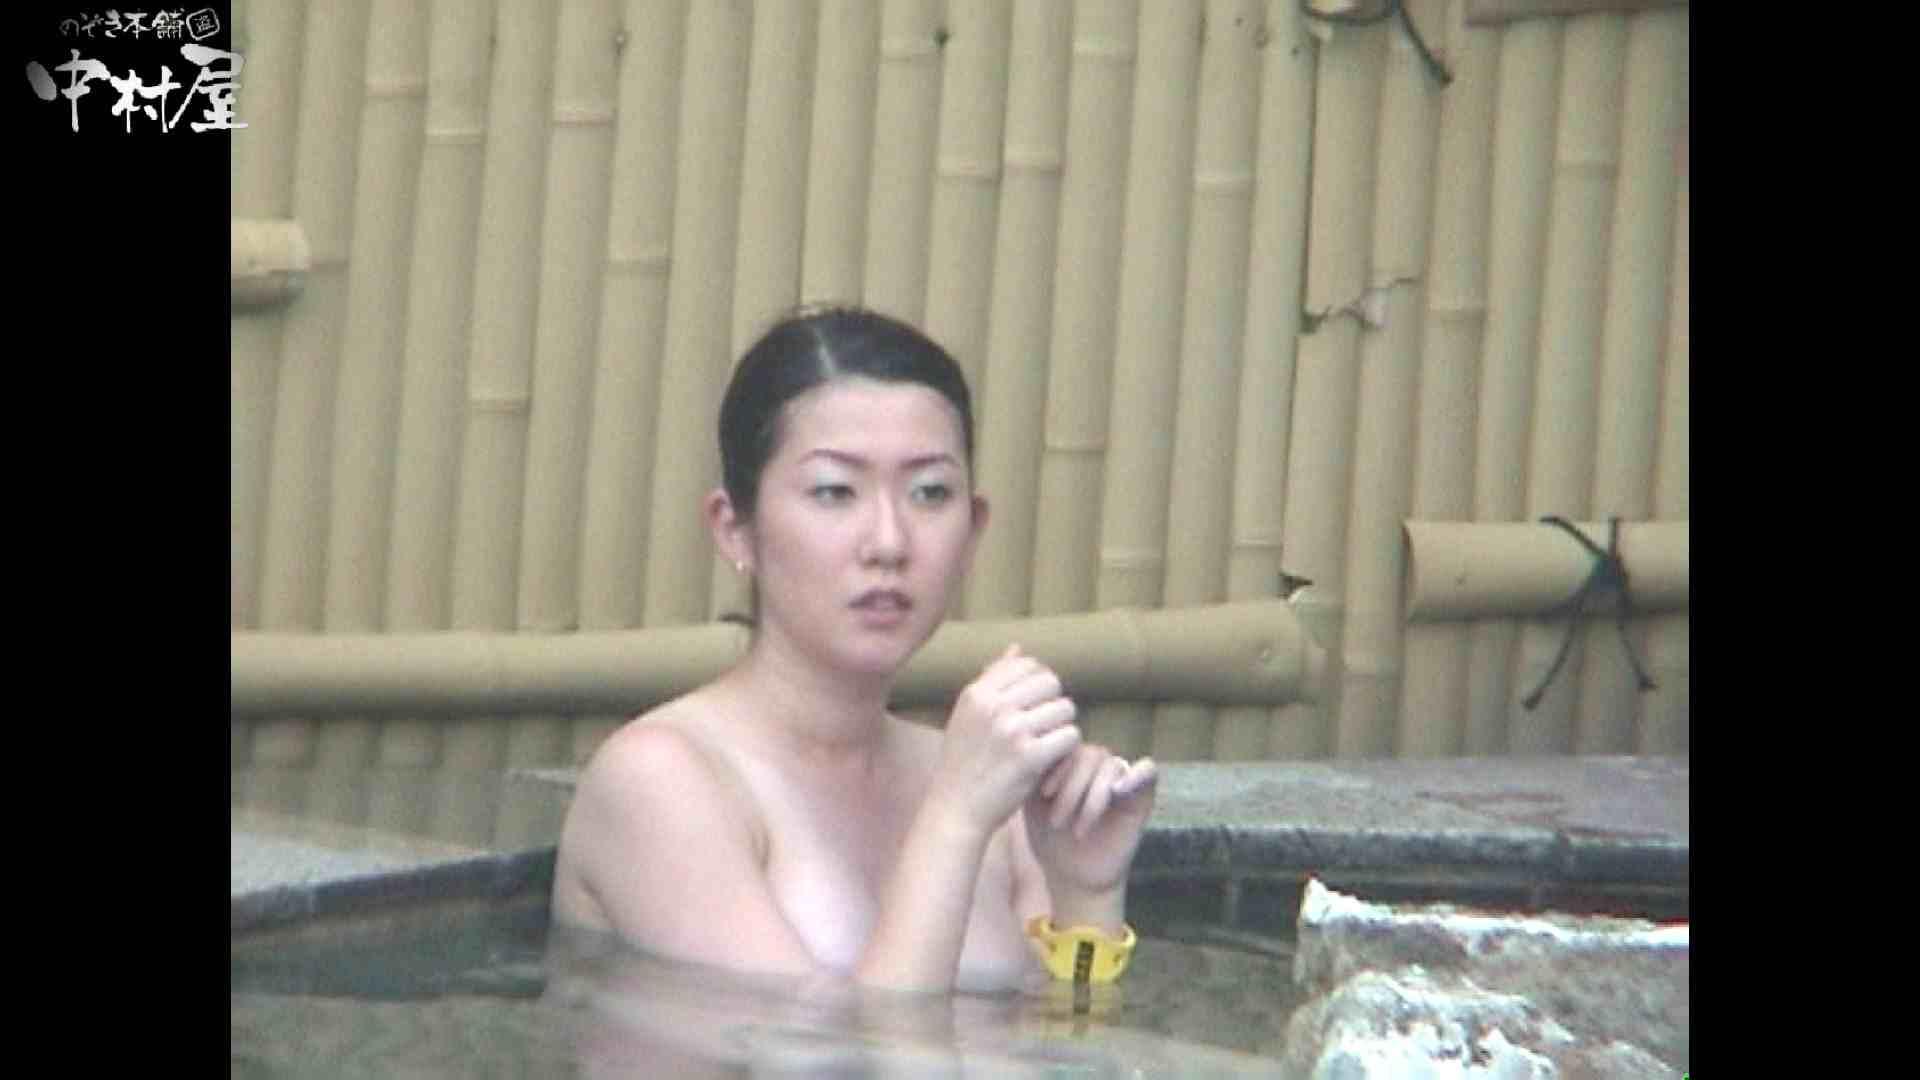 Aquaな露天風呂Vol.961 露天風呂 | OLのエロ生活  104連発 94